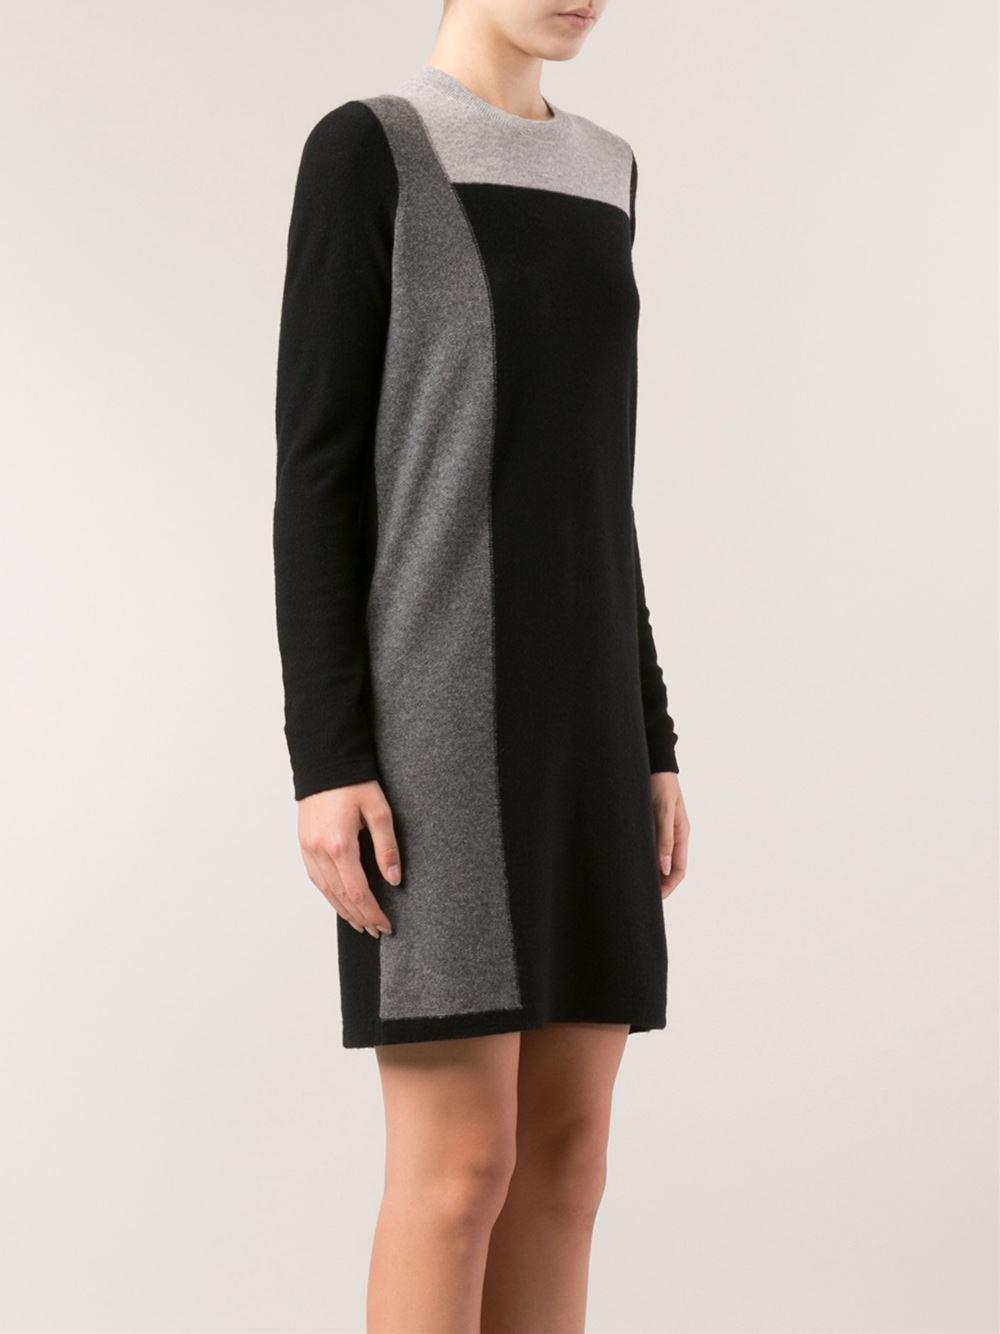 Vince color block sweater dress